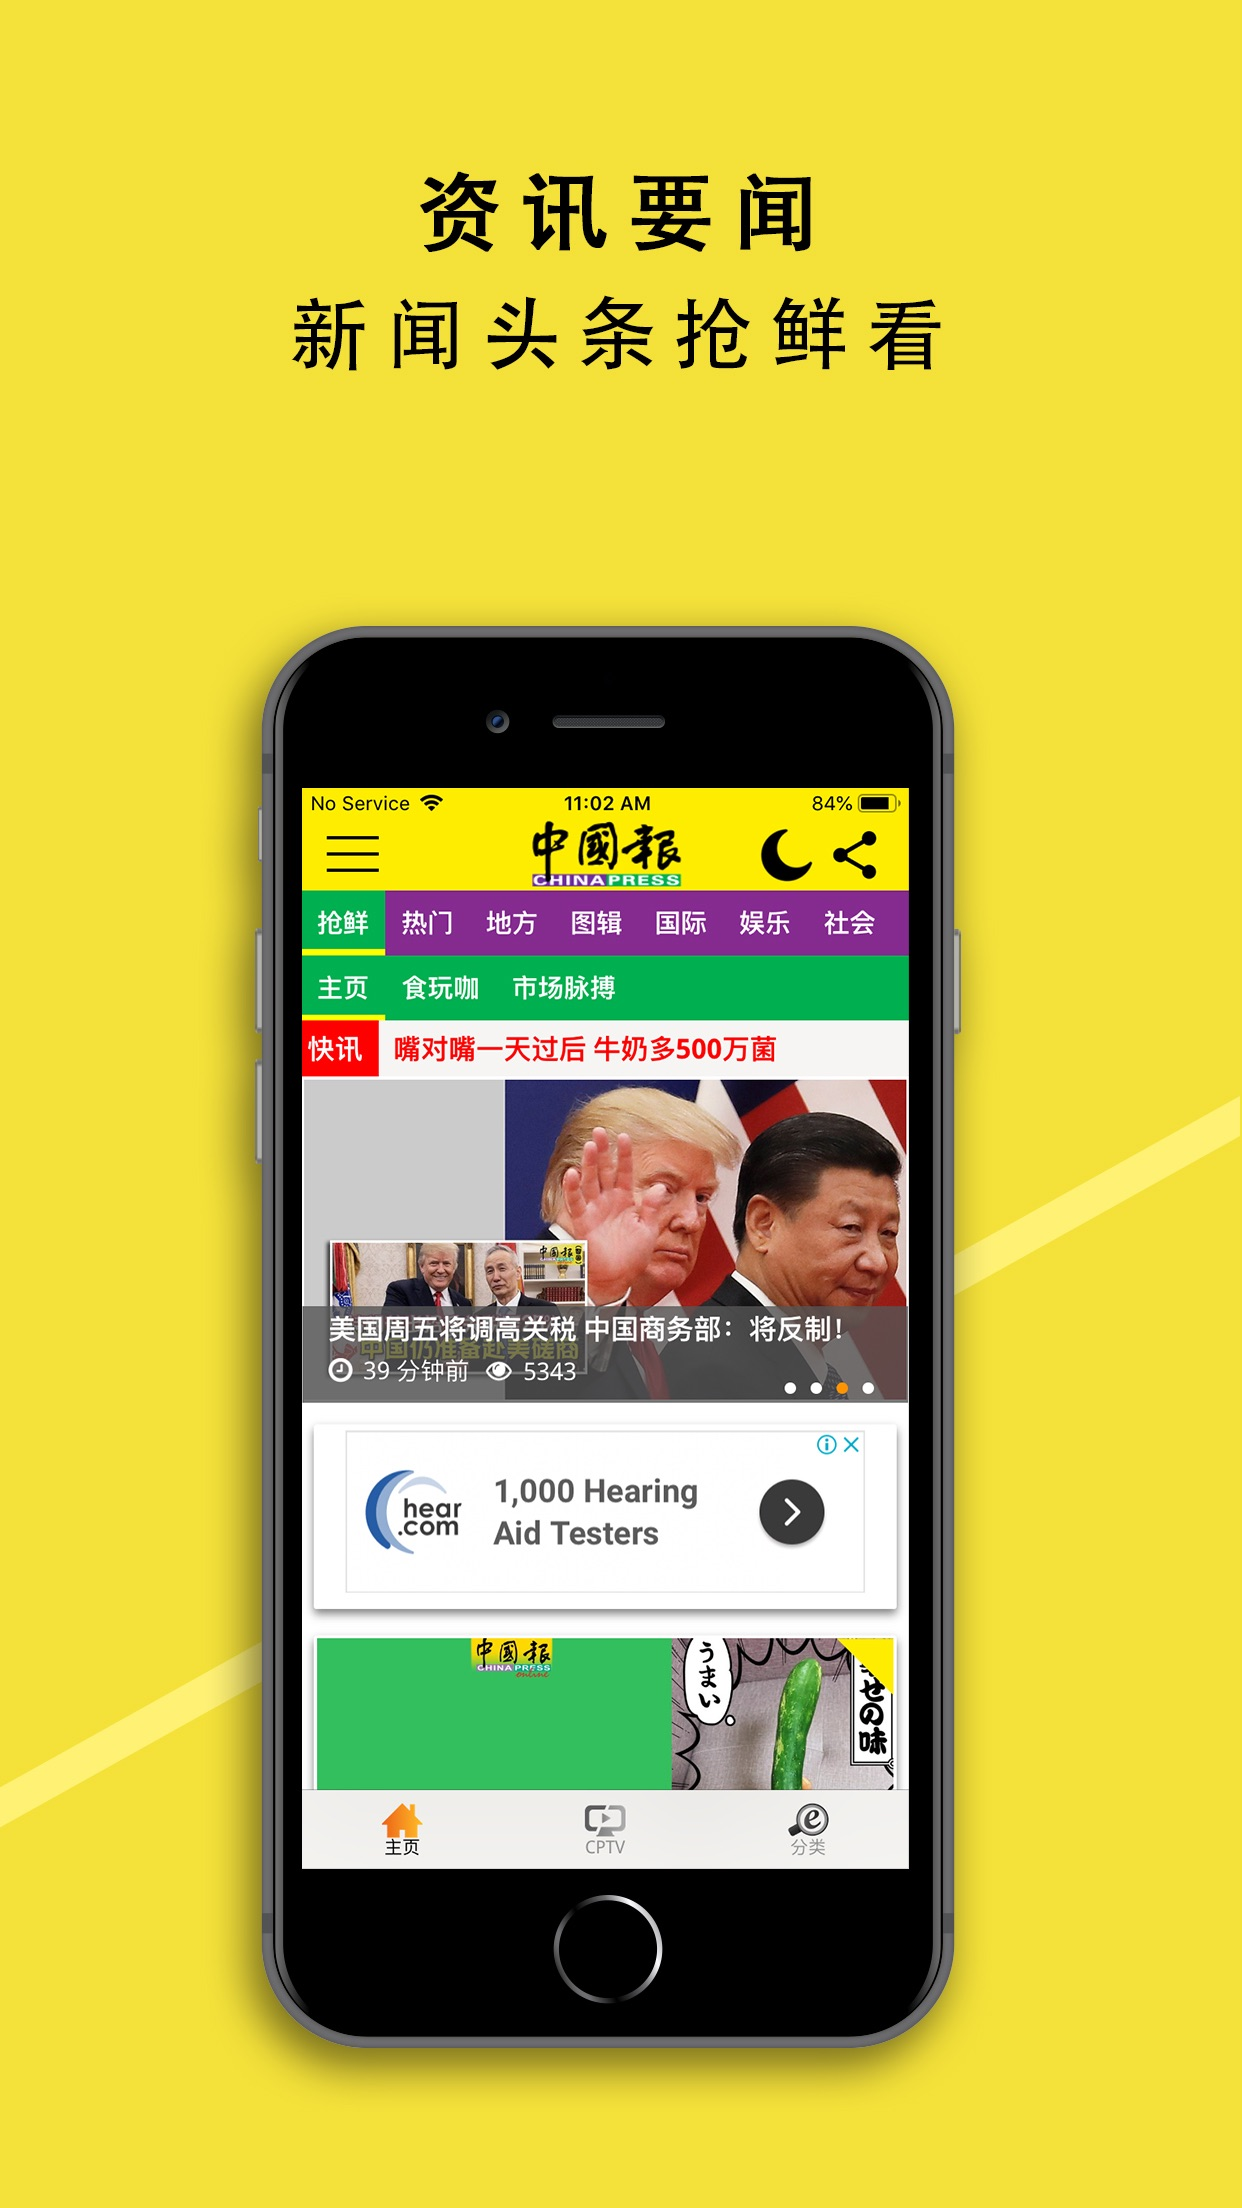 中國報 App Screenshot